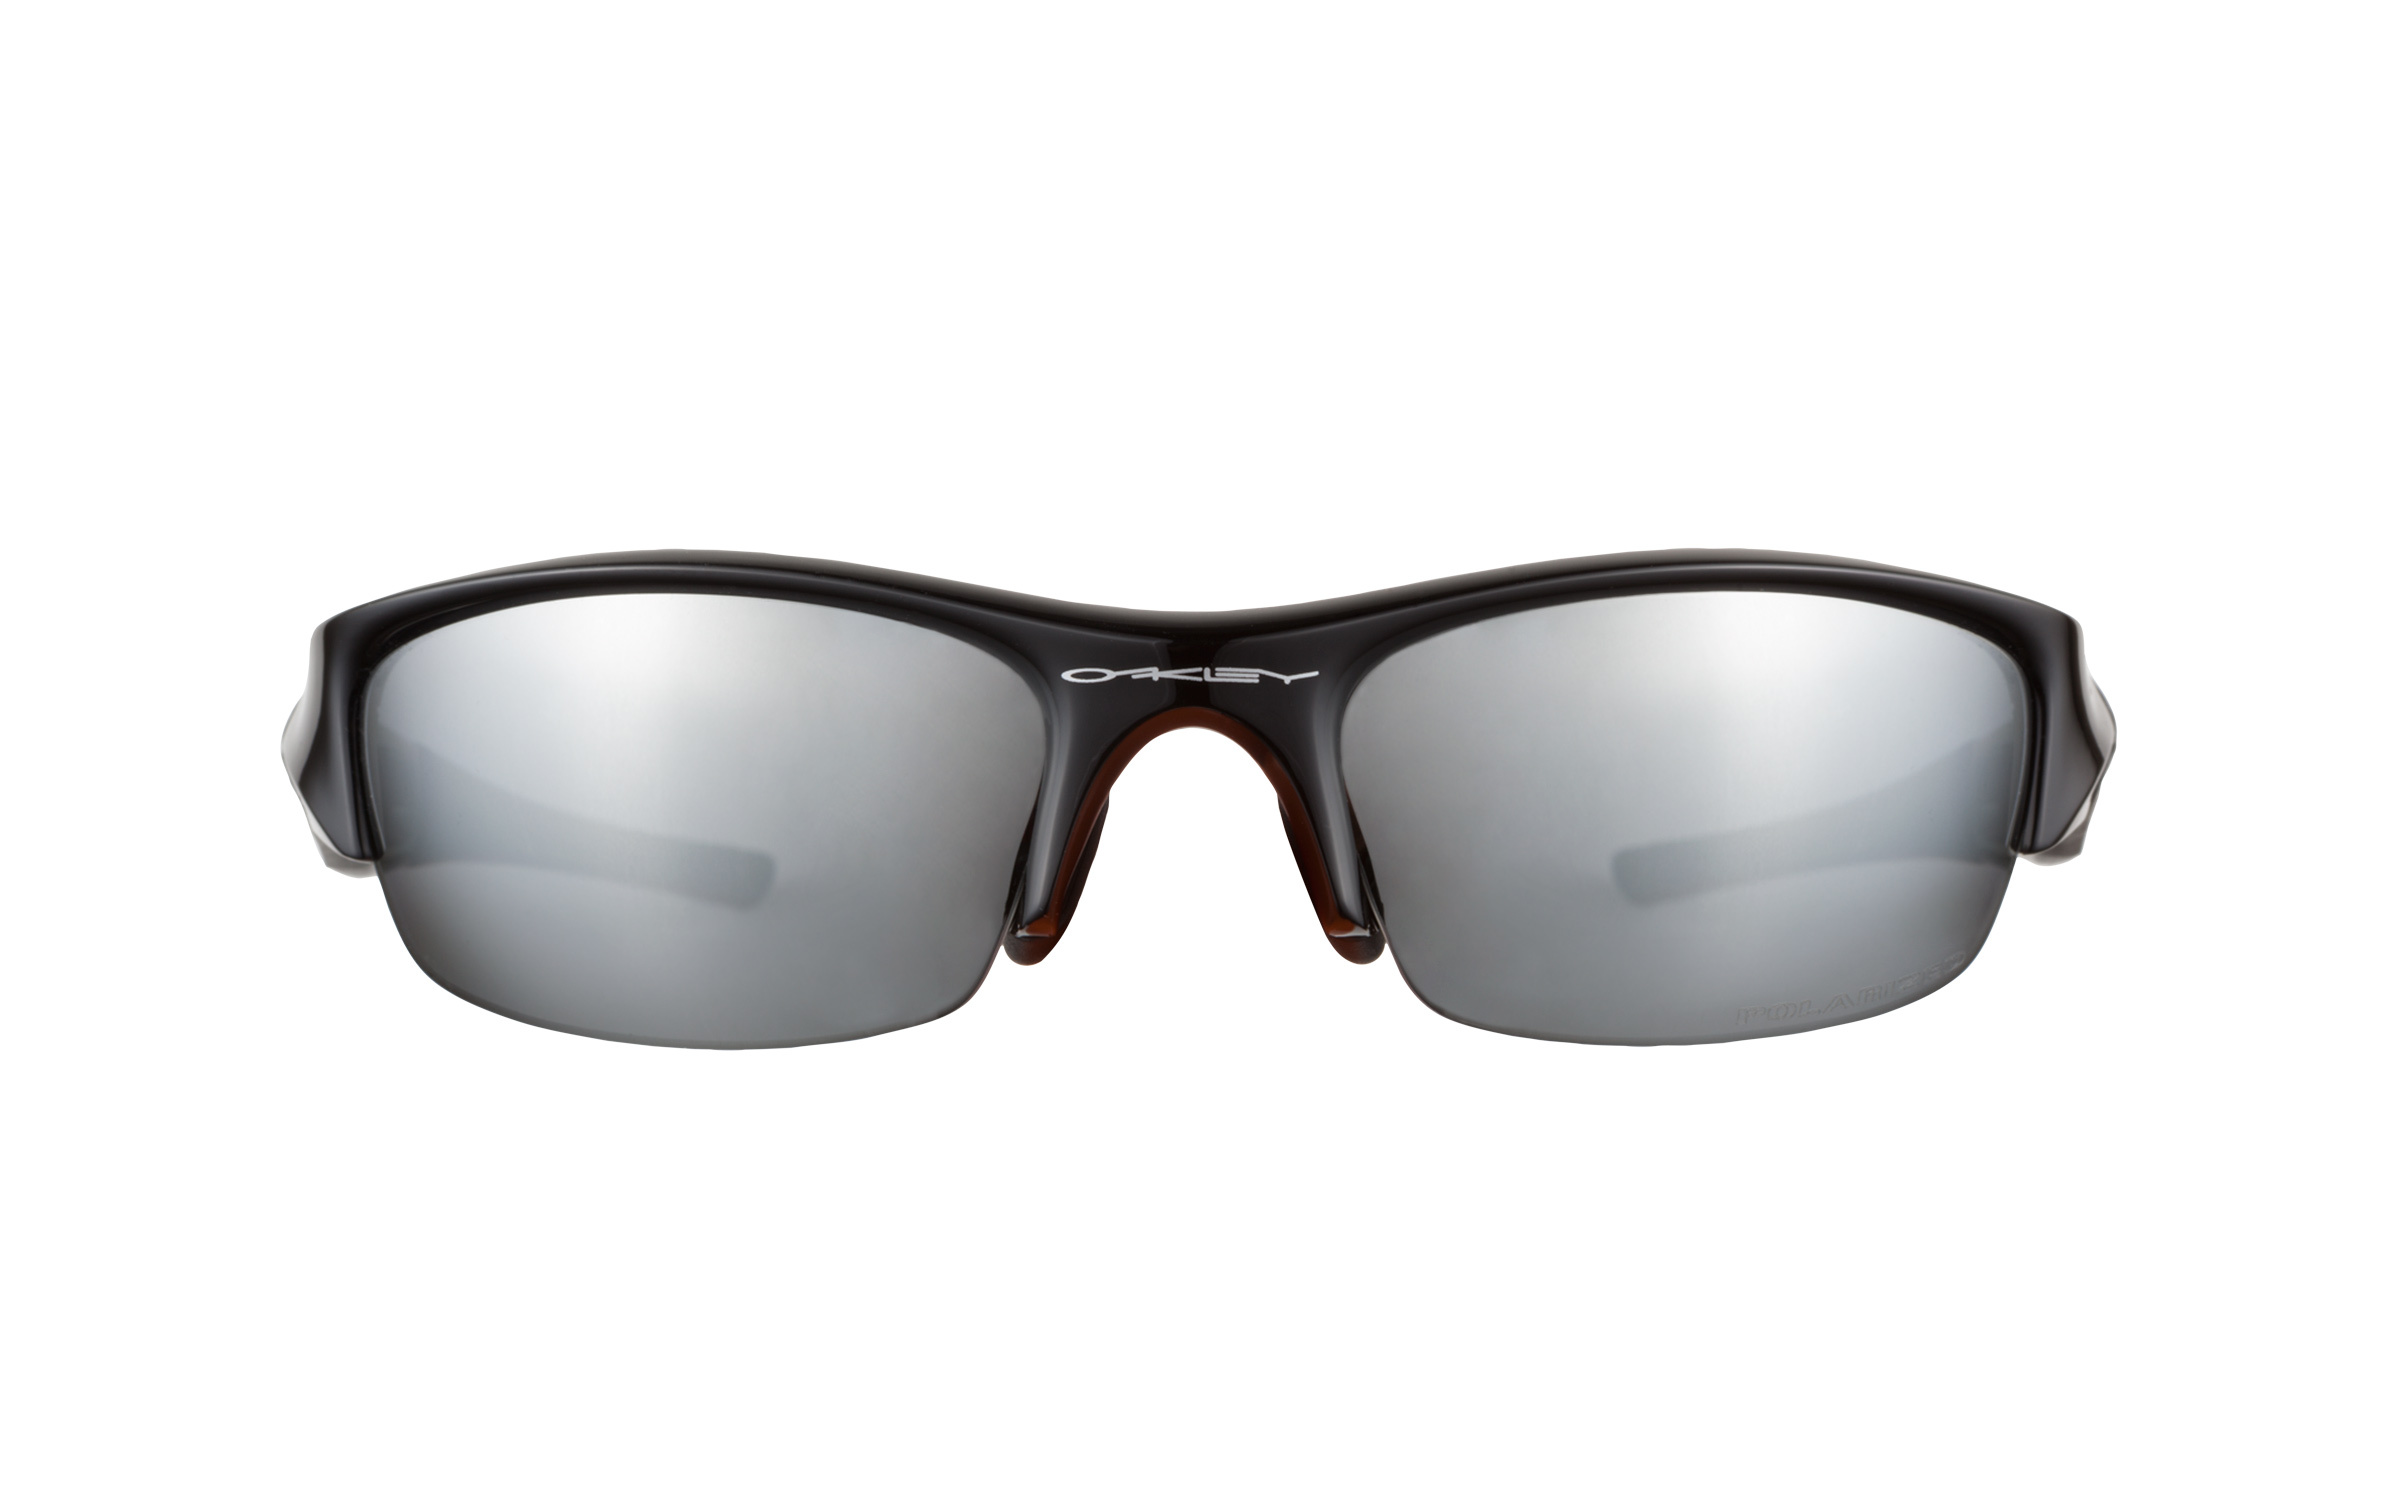 Oakley Flak Jacket 12 900 Black Polarized Sunglasses